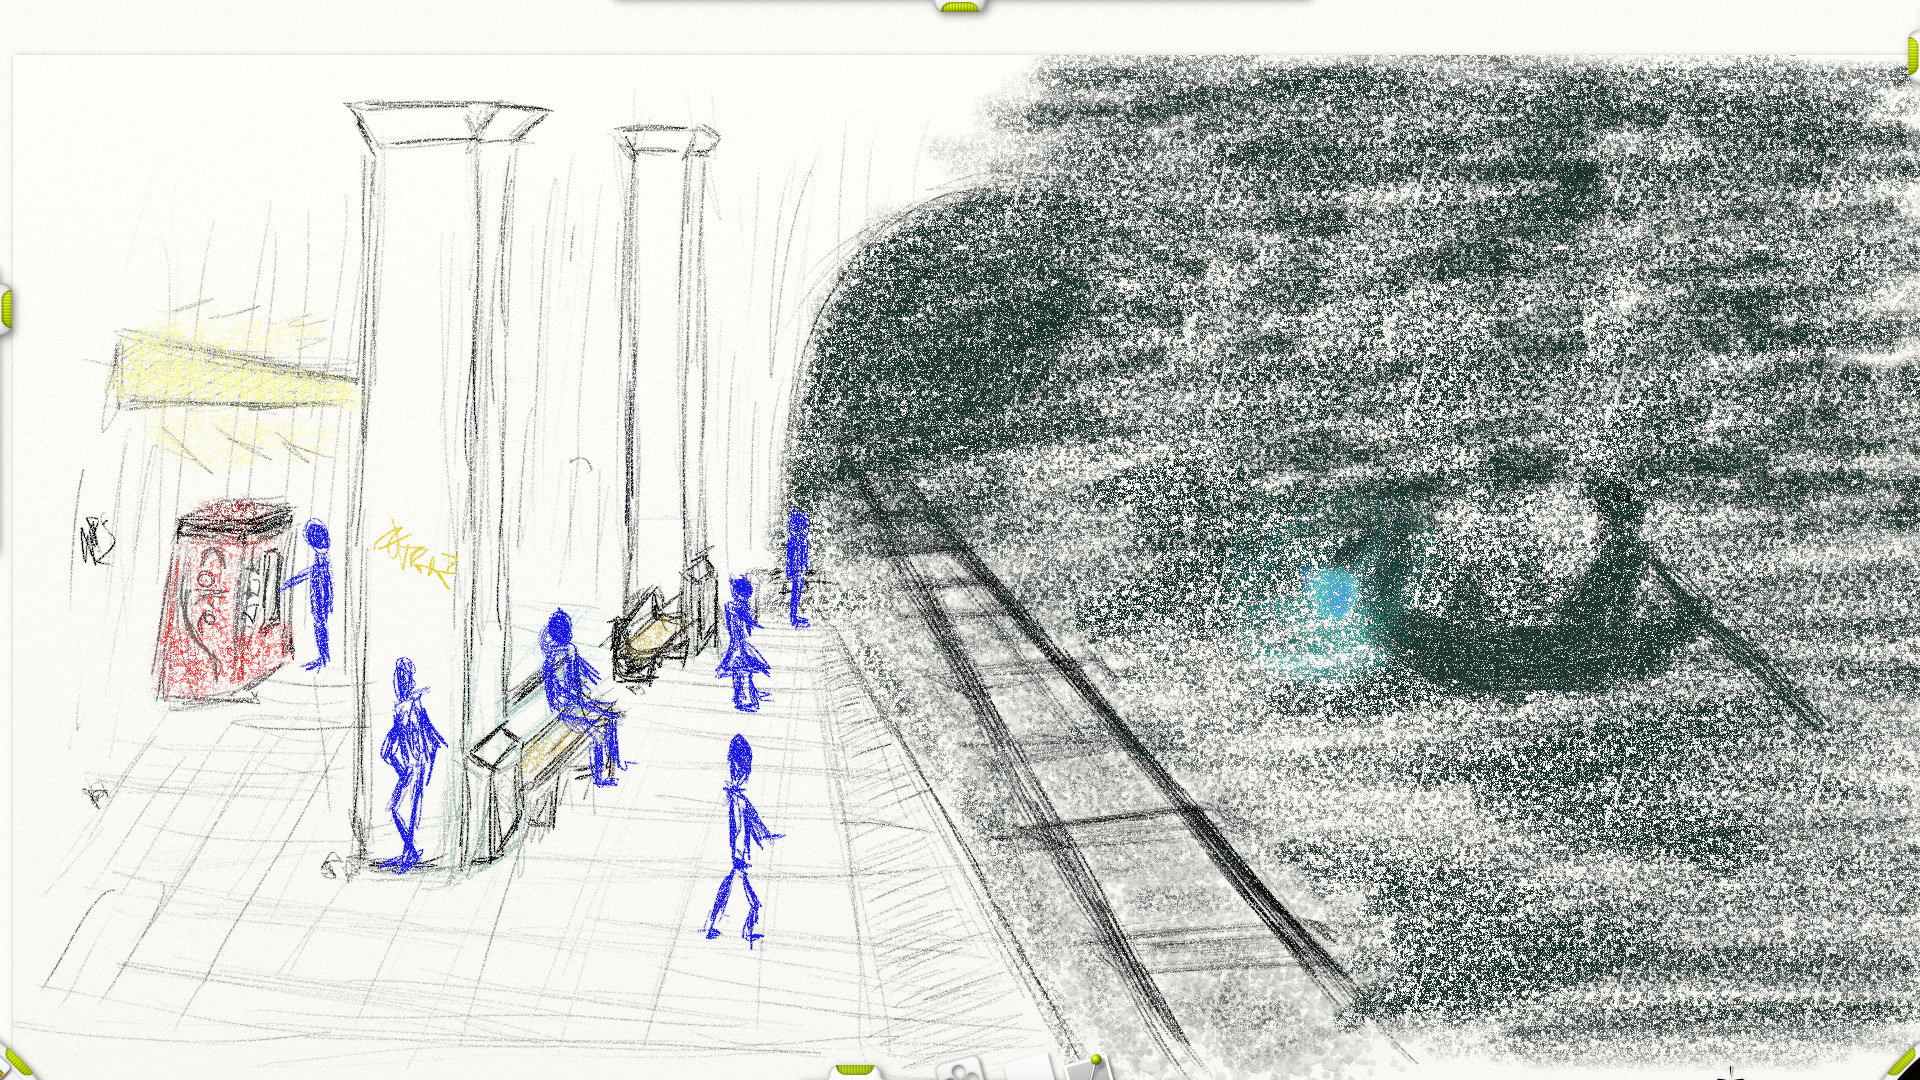 Styx: Moodboard / SzenenzeichnungStyx: moodboard / scene sketch